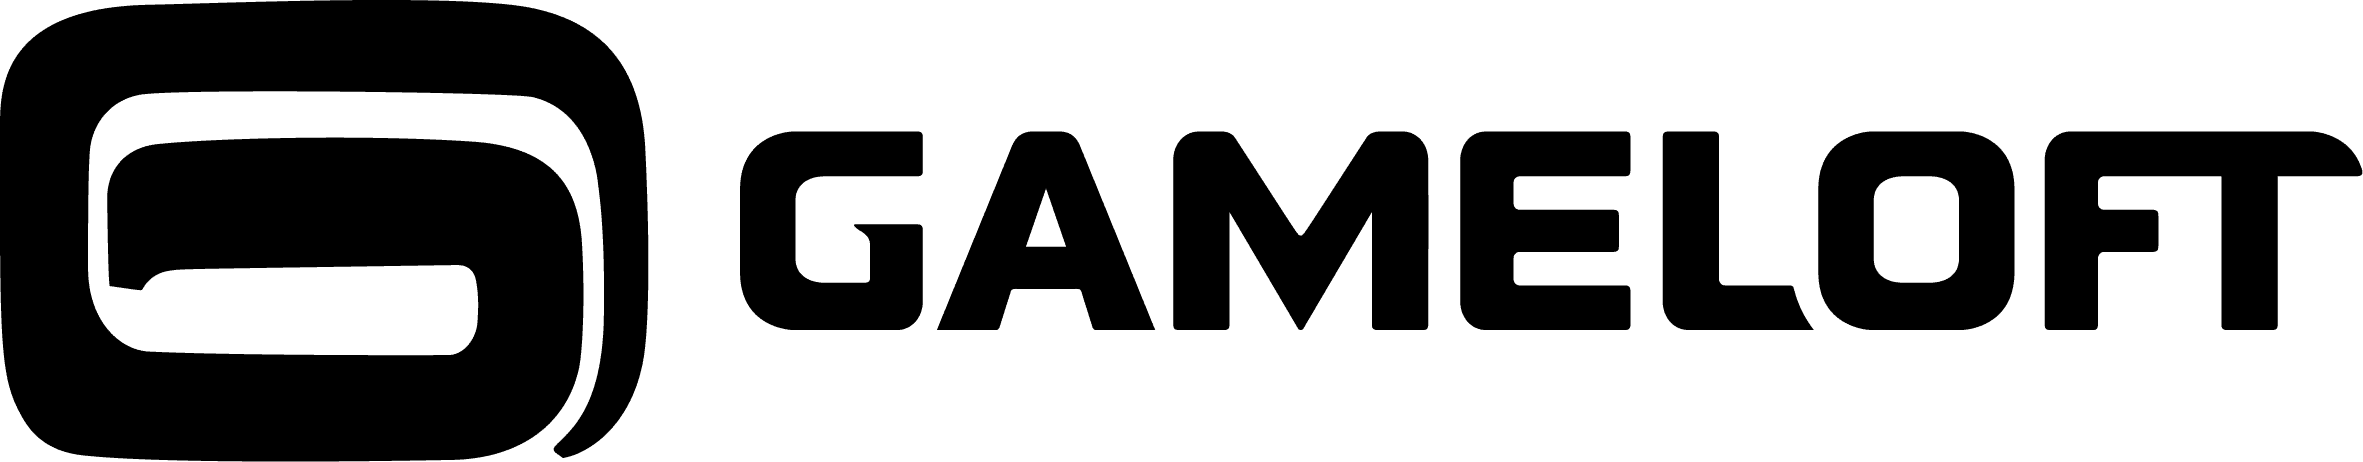 Логотип Gameloft